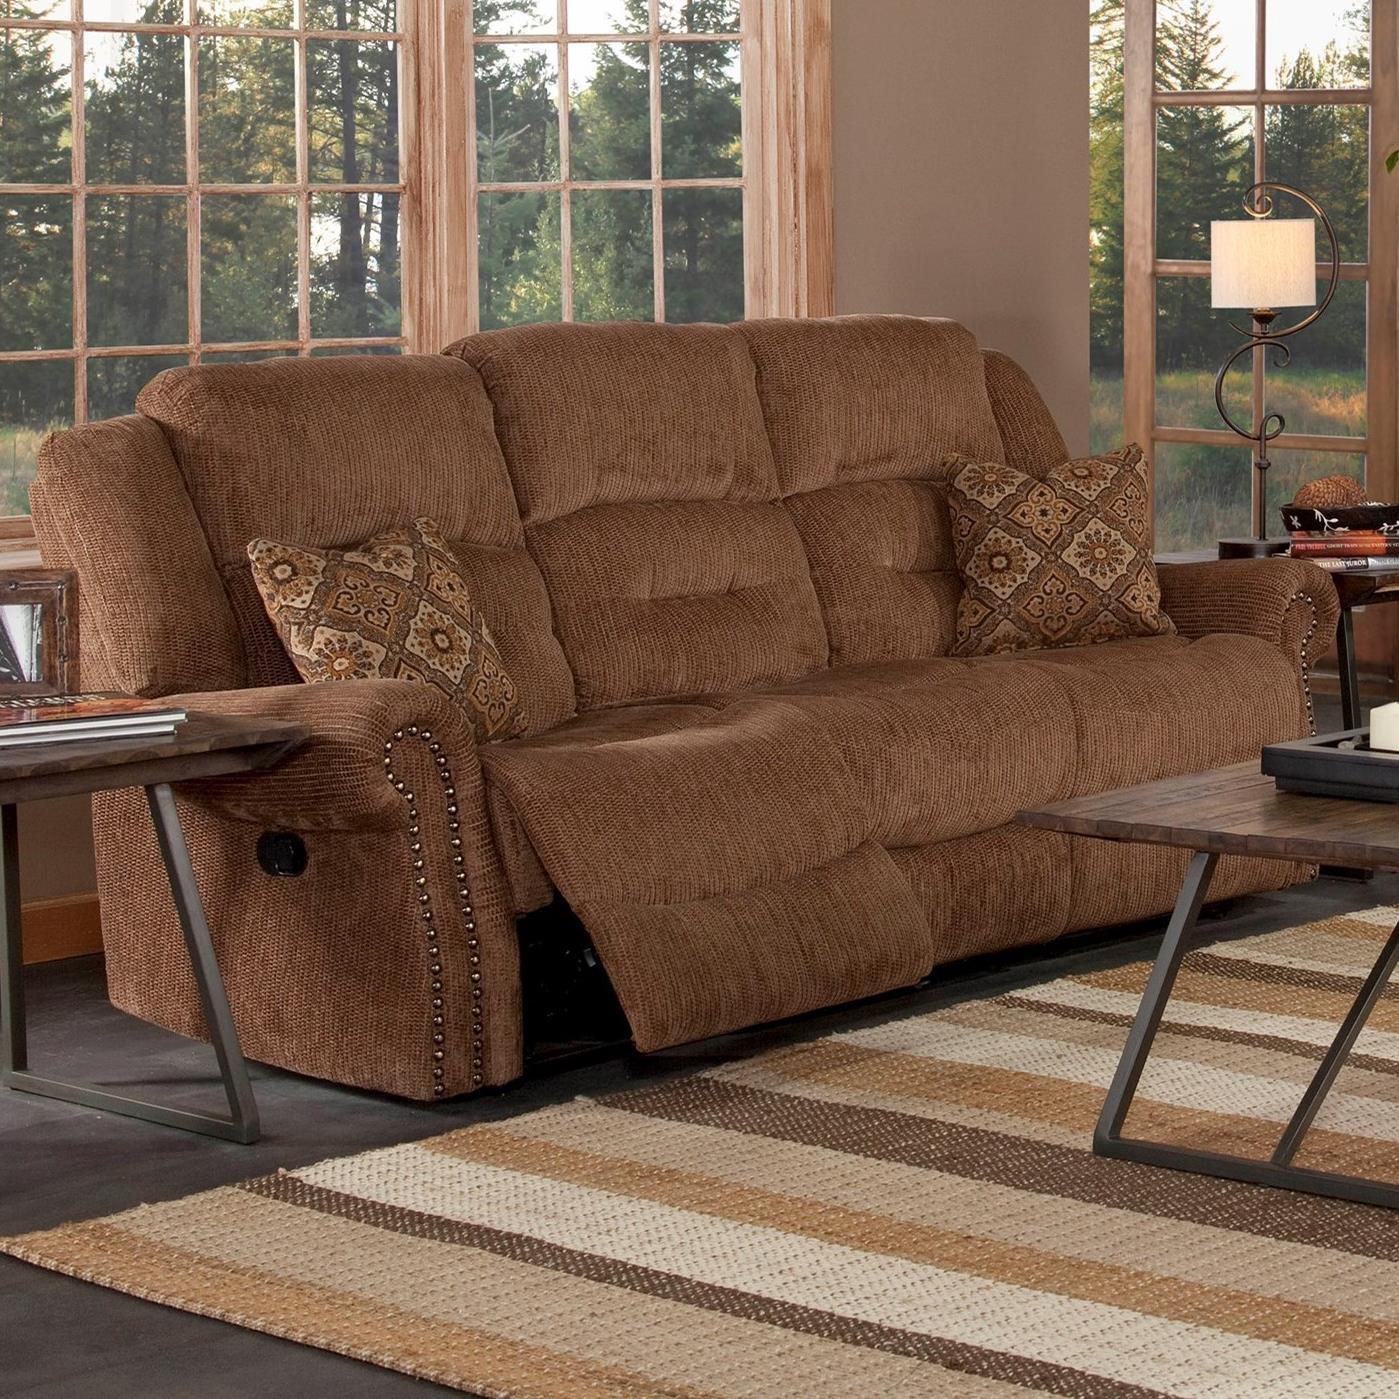 reclining sofa with nailhead trim standard set size new classic jasper power boulevard home furnishings sofas